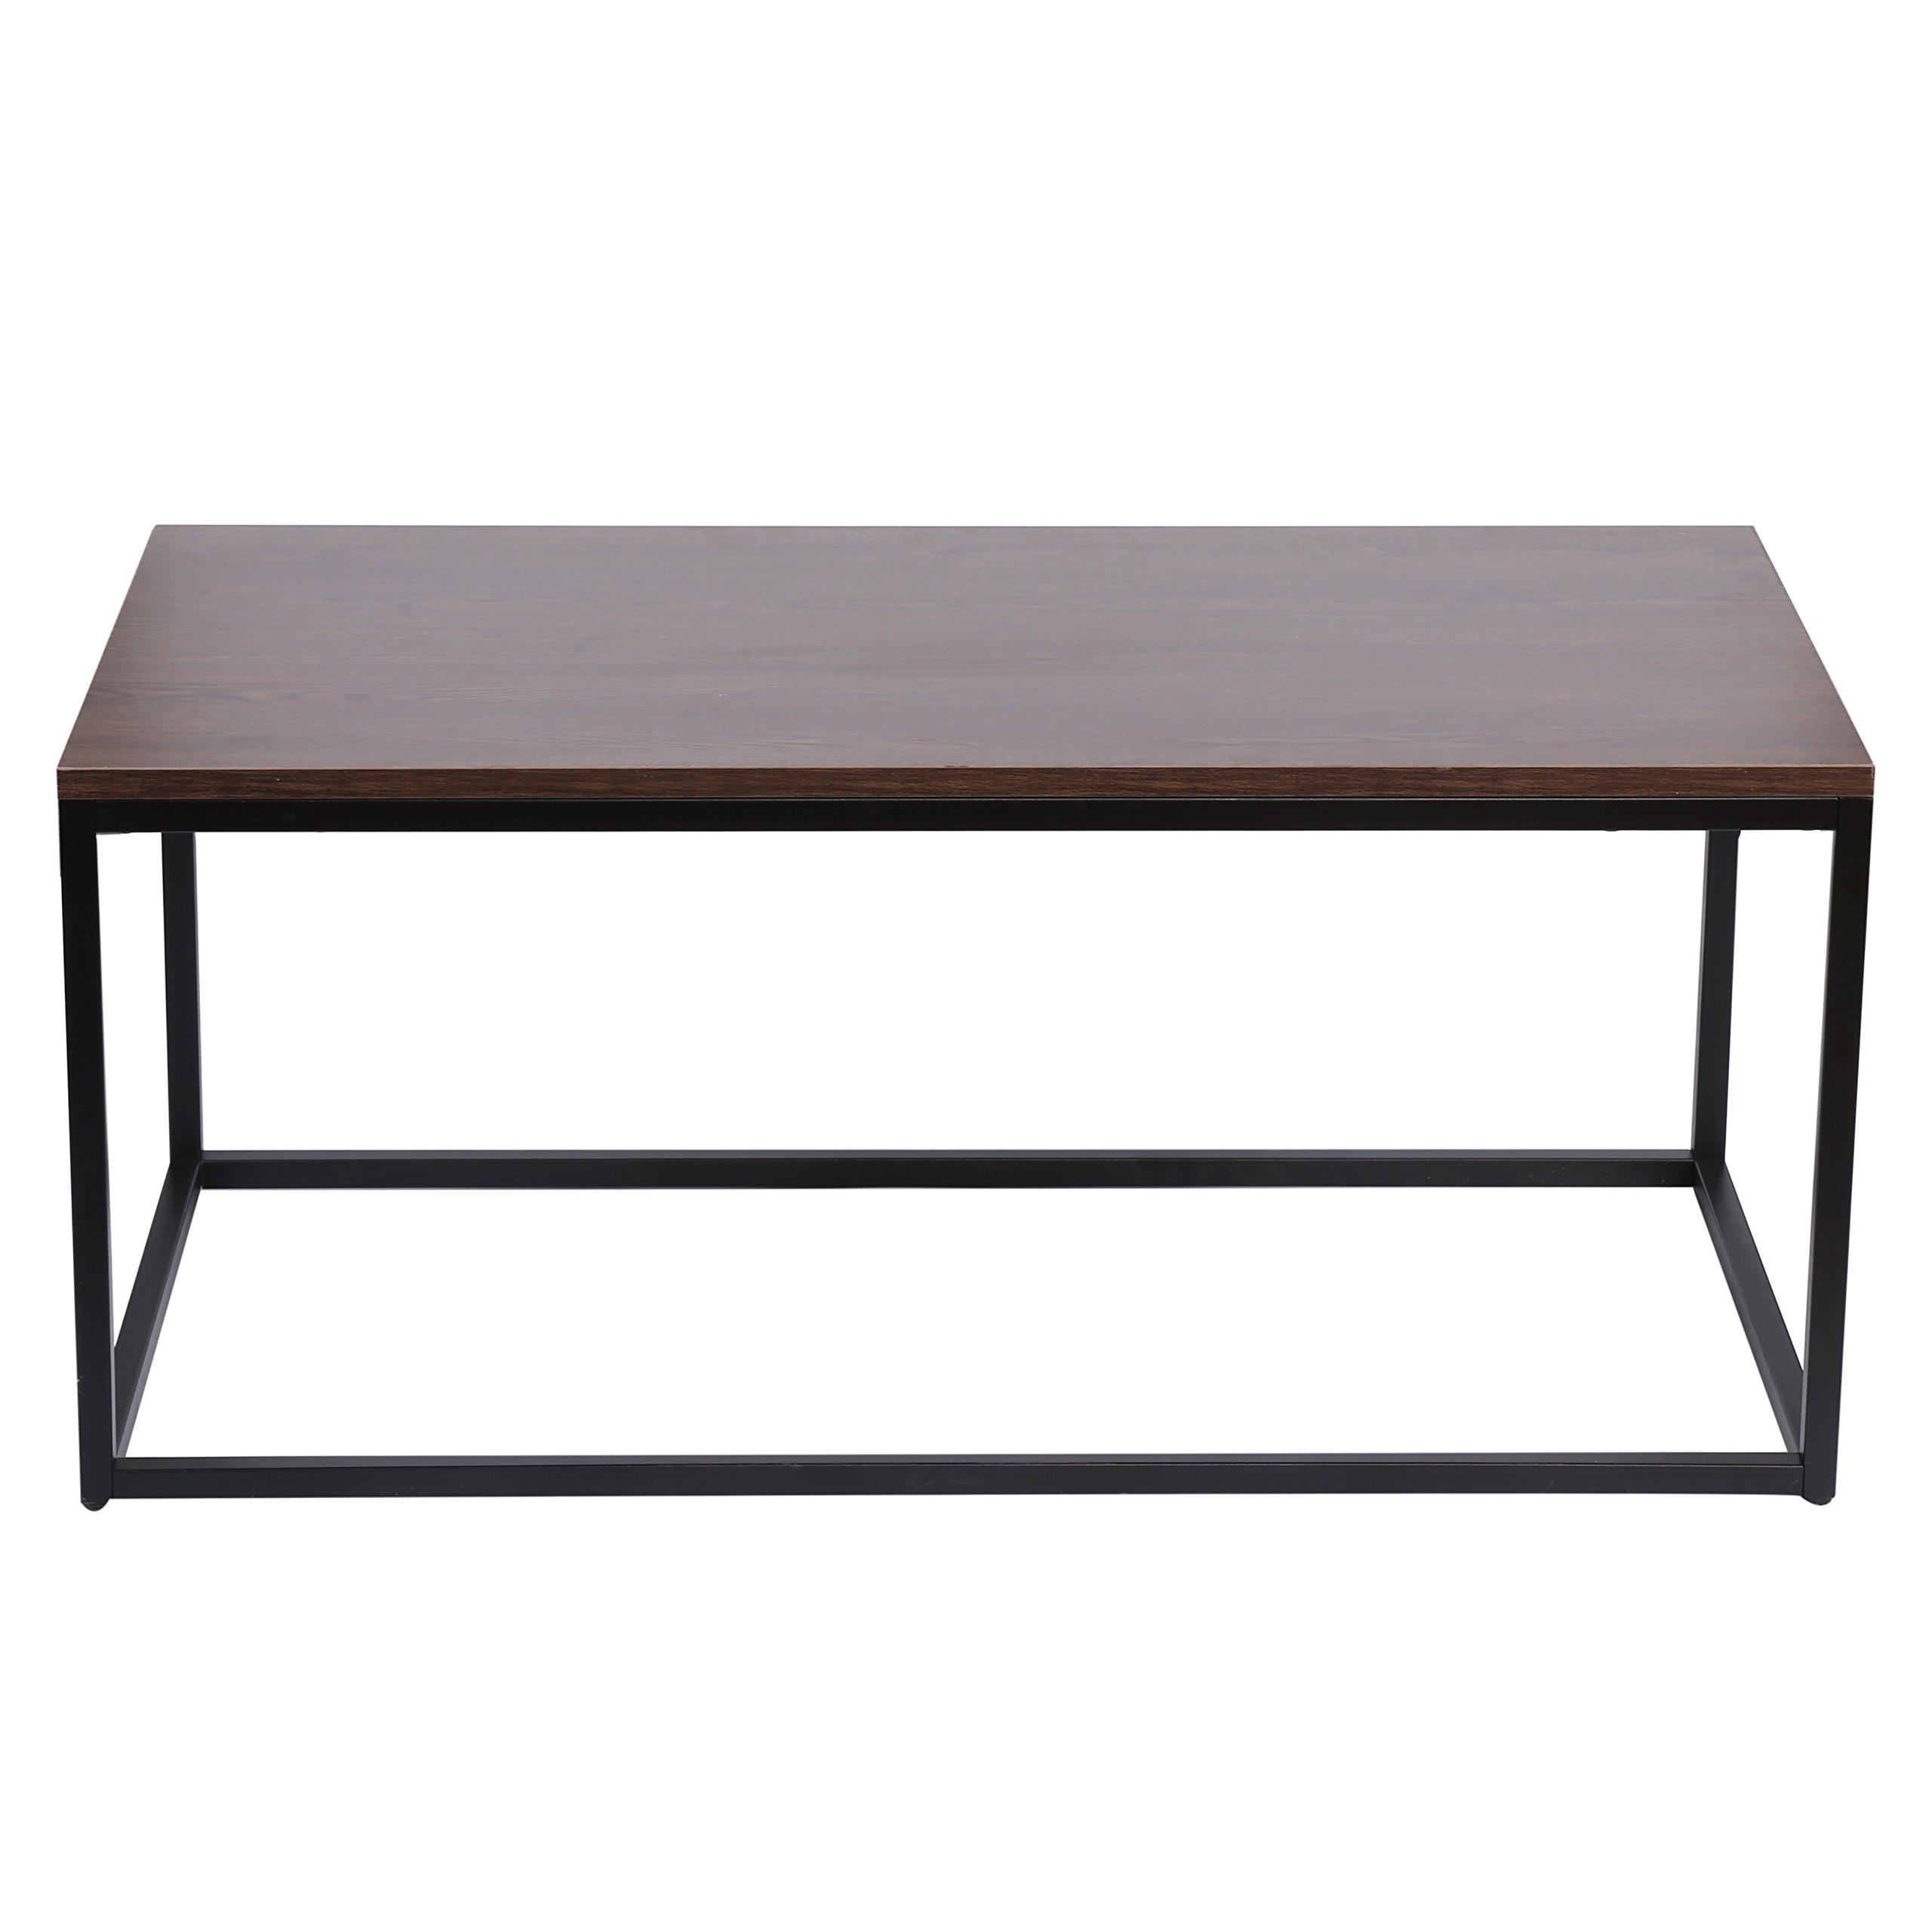 KELLIGO Coffee End Side Table For Living Room Classic Modern Rectangular (brown)